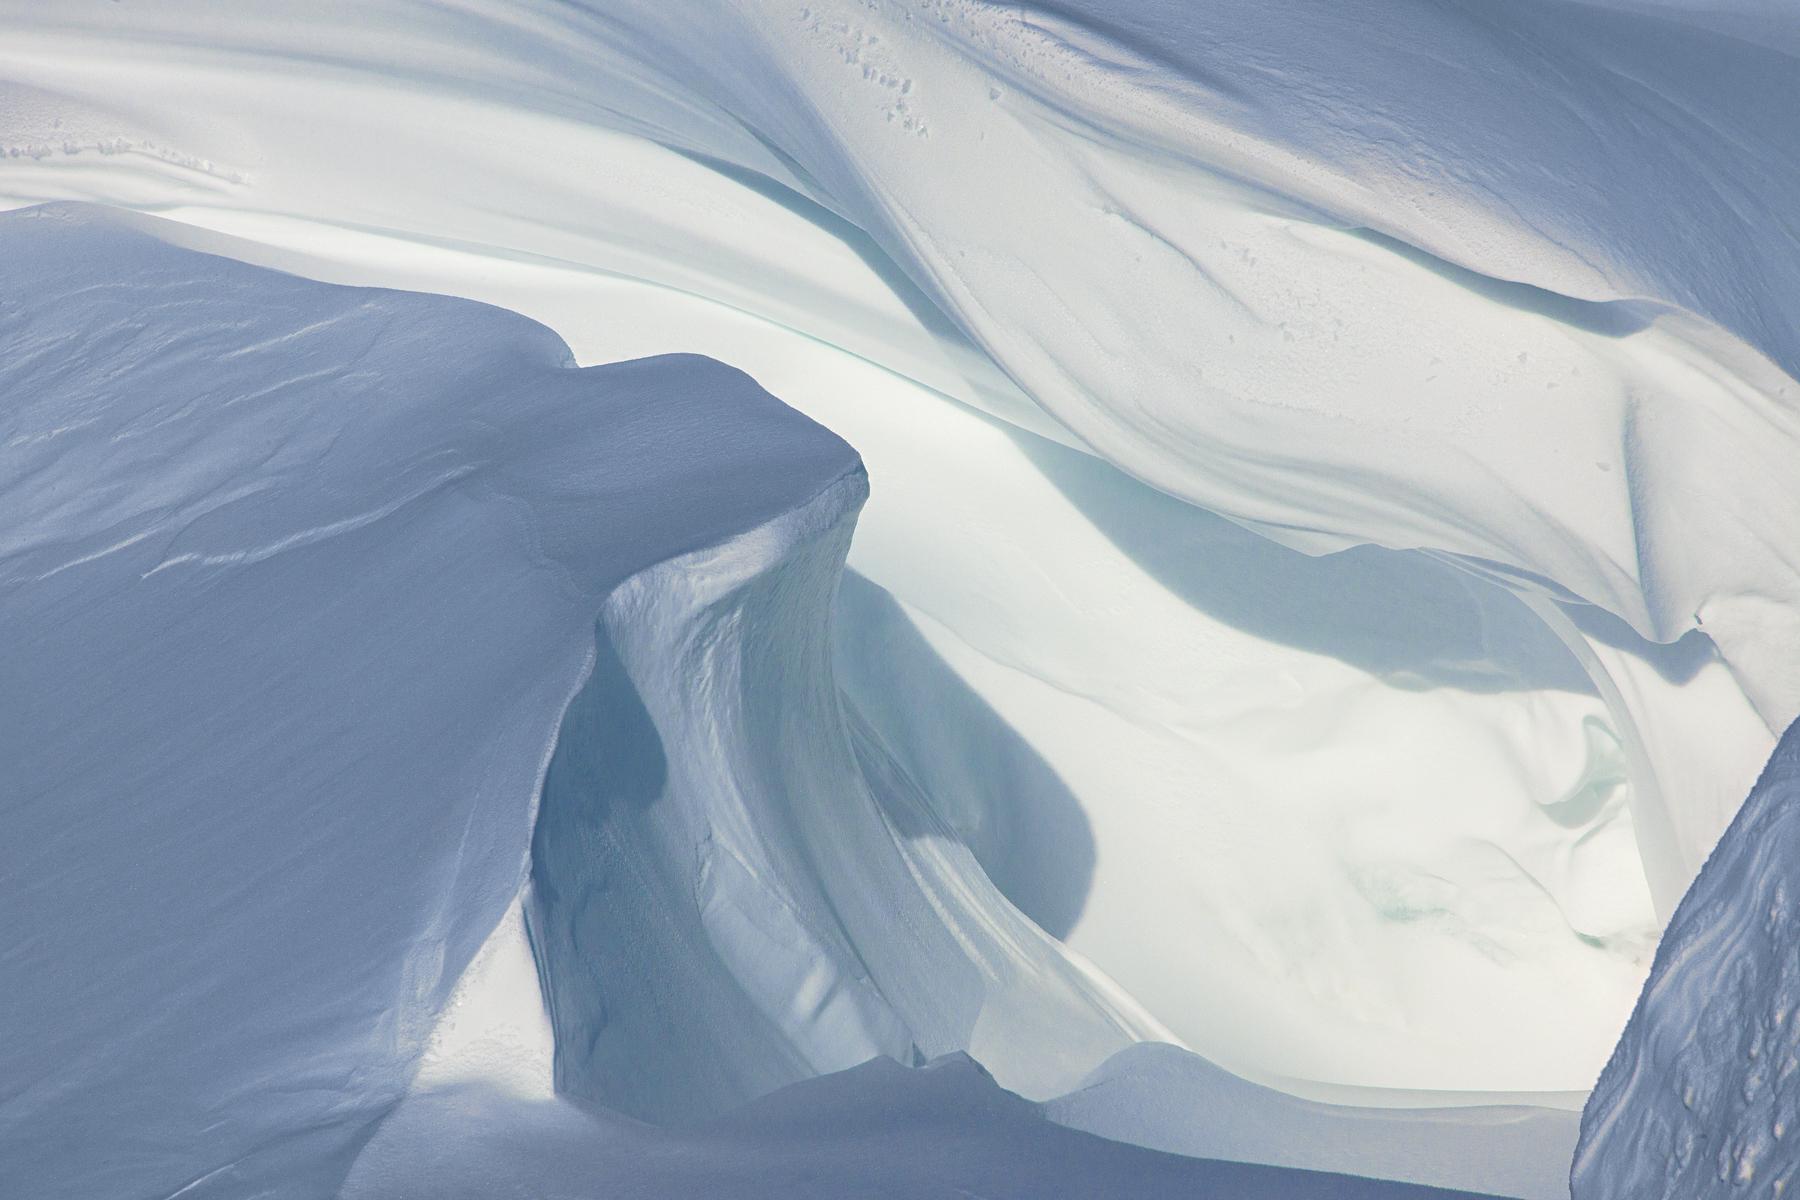 Snow Folds, Scott Base Pressure Ridges